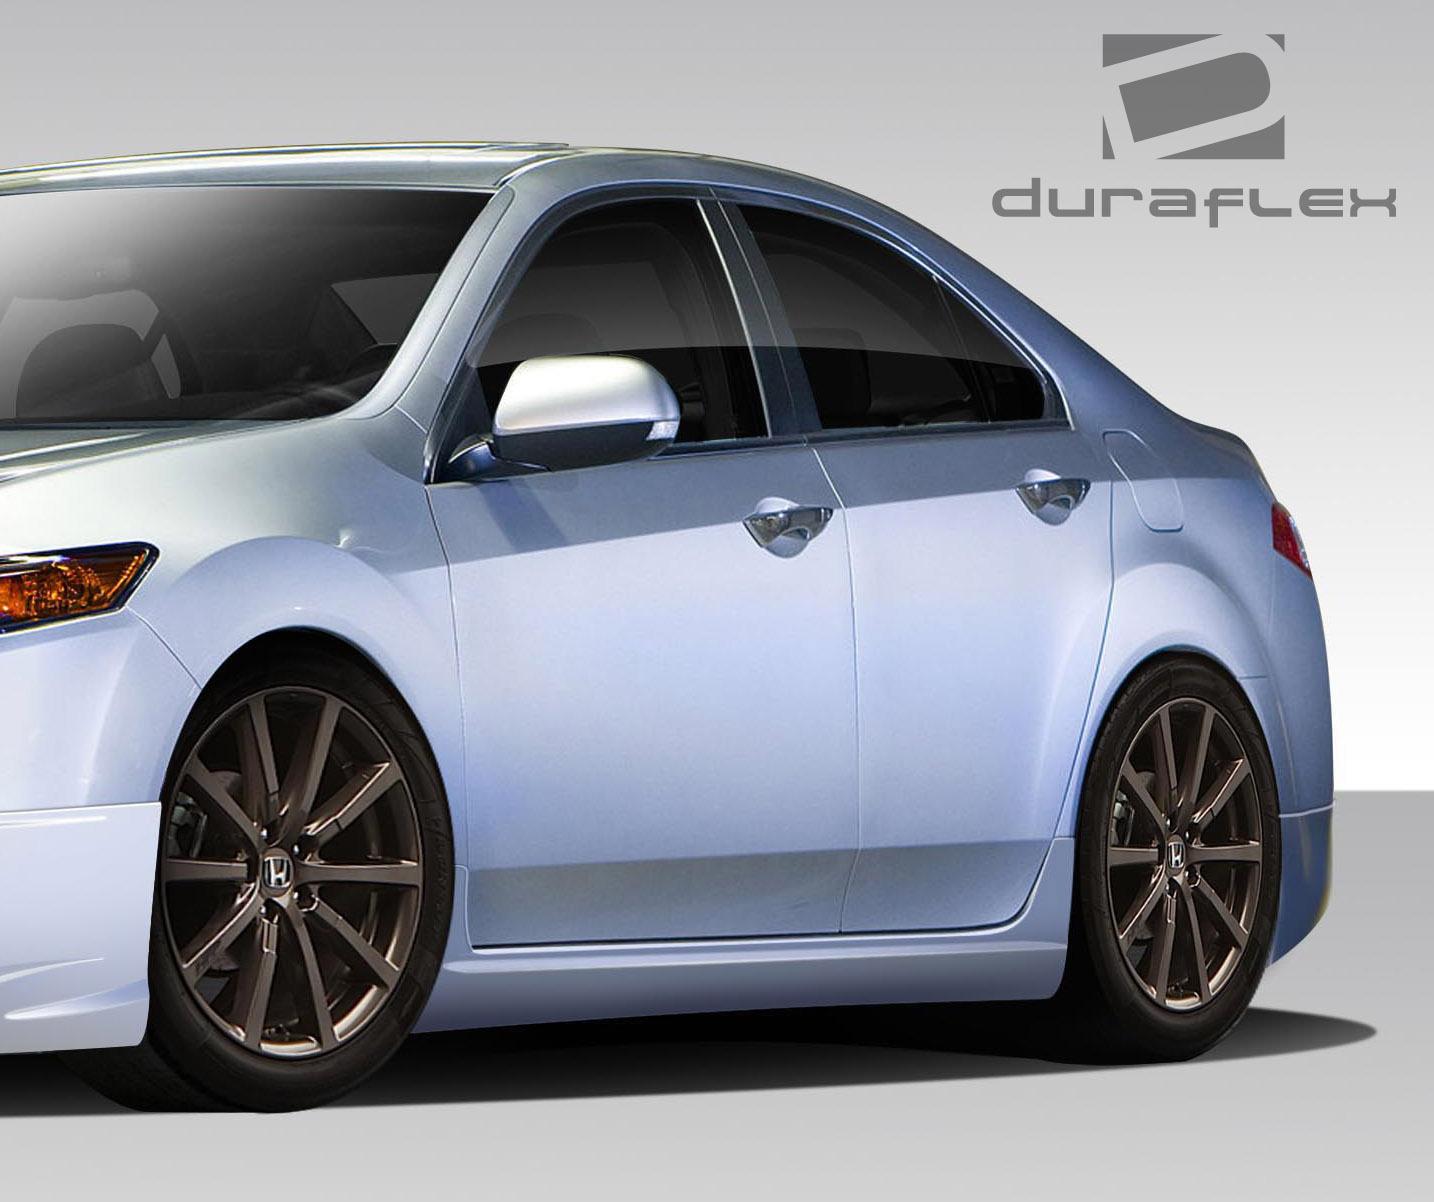 09-10 Acura TSX Type M Duraflex Full Body Kit!!! 108766